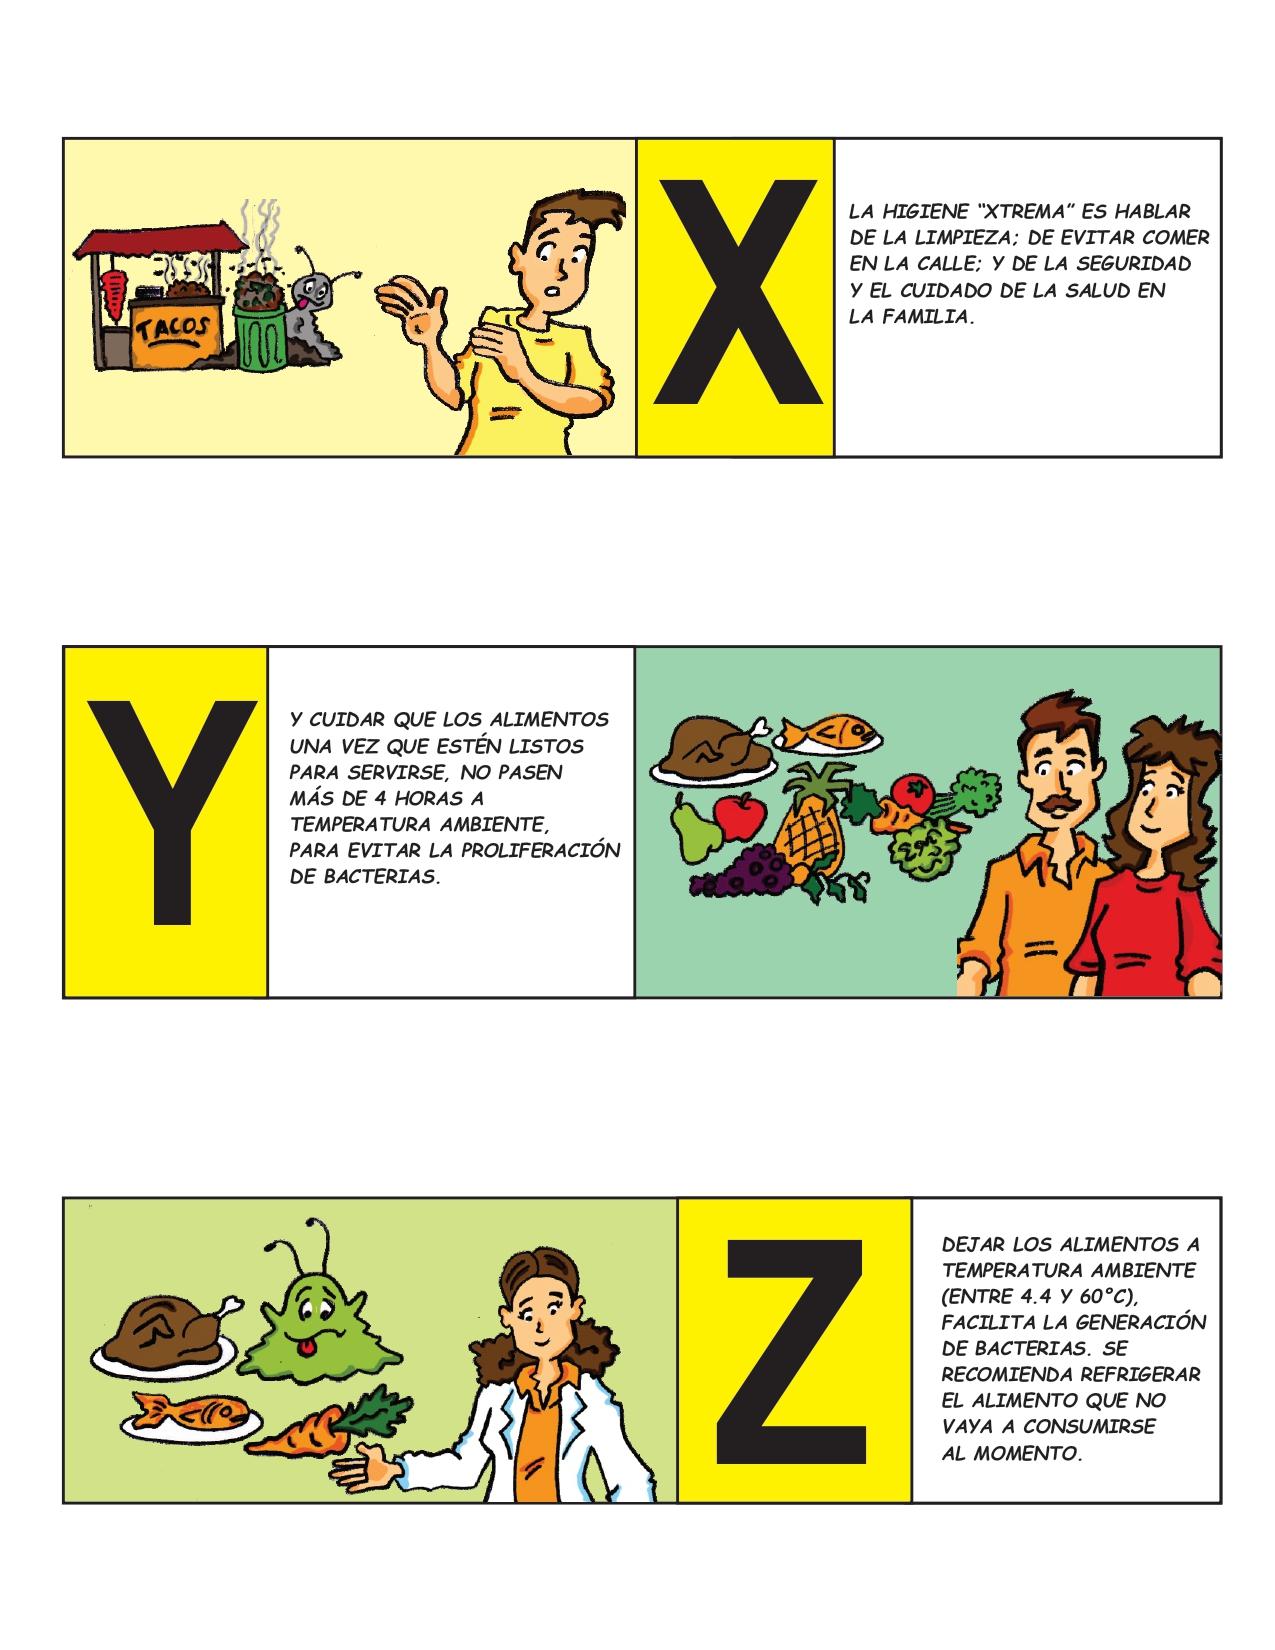 ABC higiene de alimentos digital_page-0009